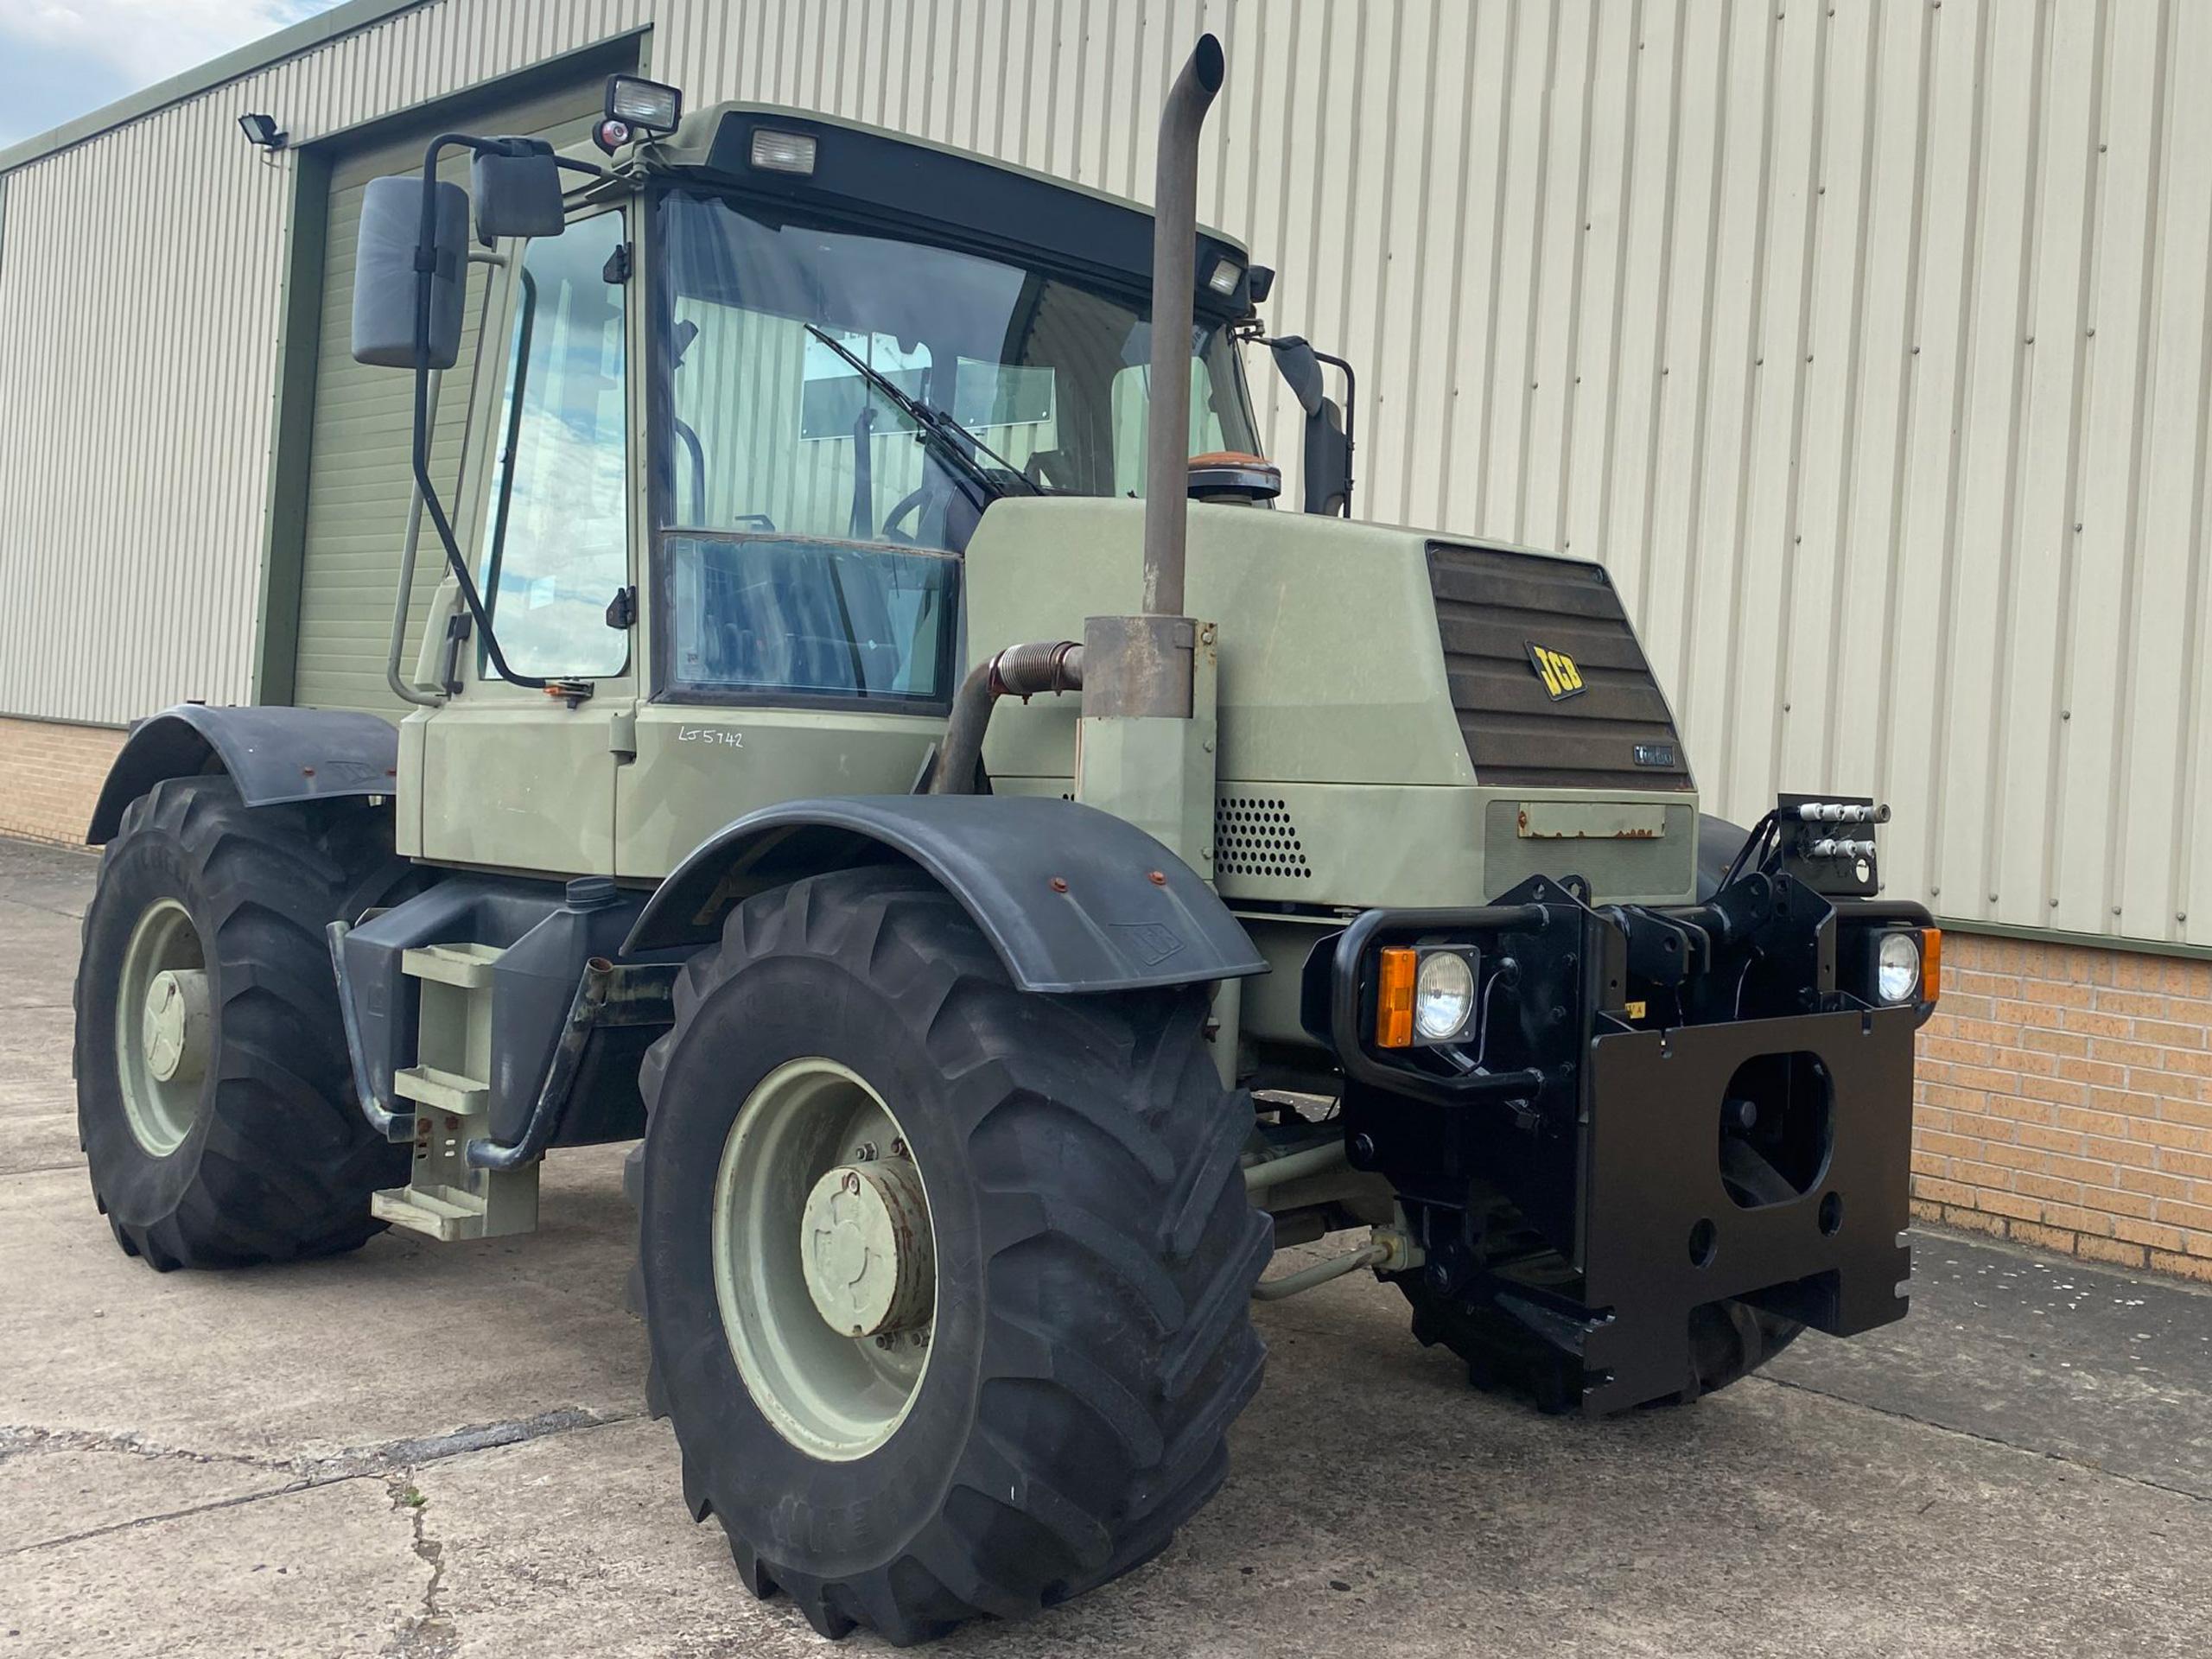 JCB fastrac 150T 80 ex MoD - ex military vehicles for sale, mod surplus